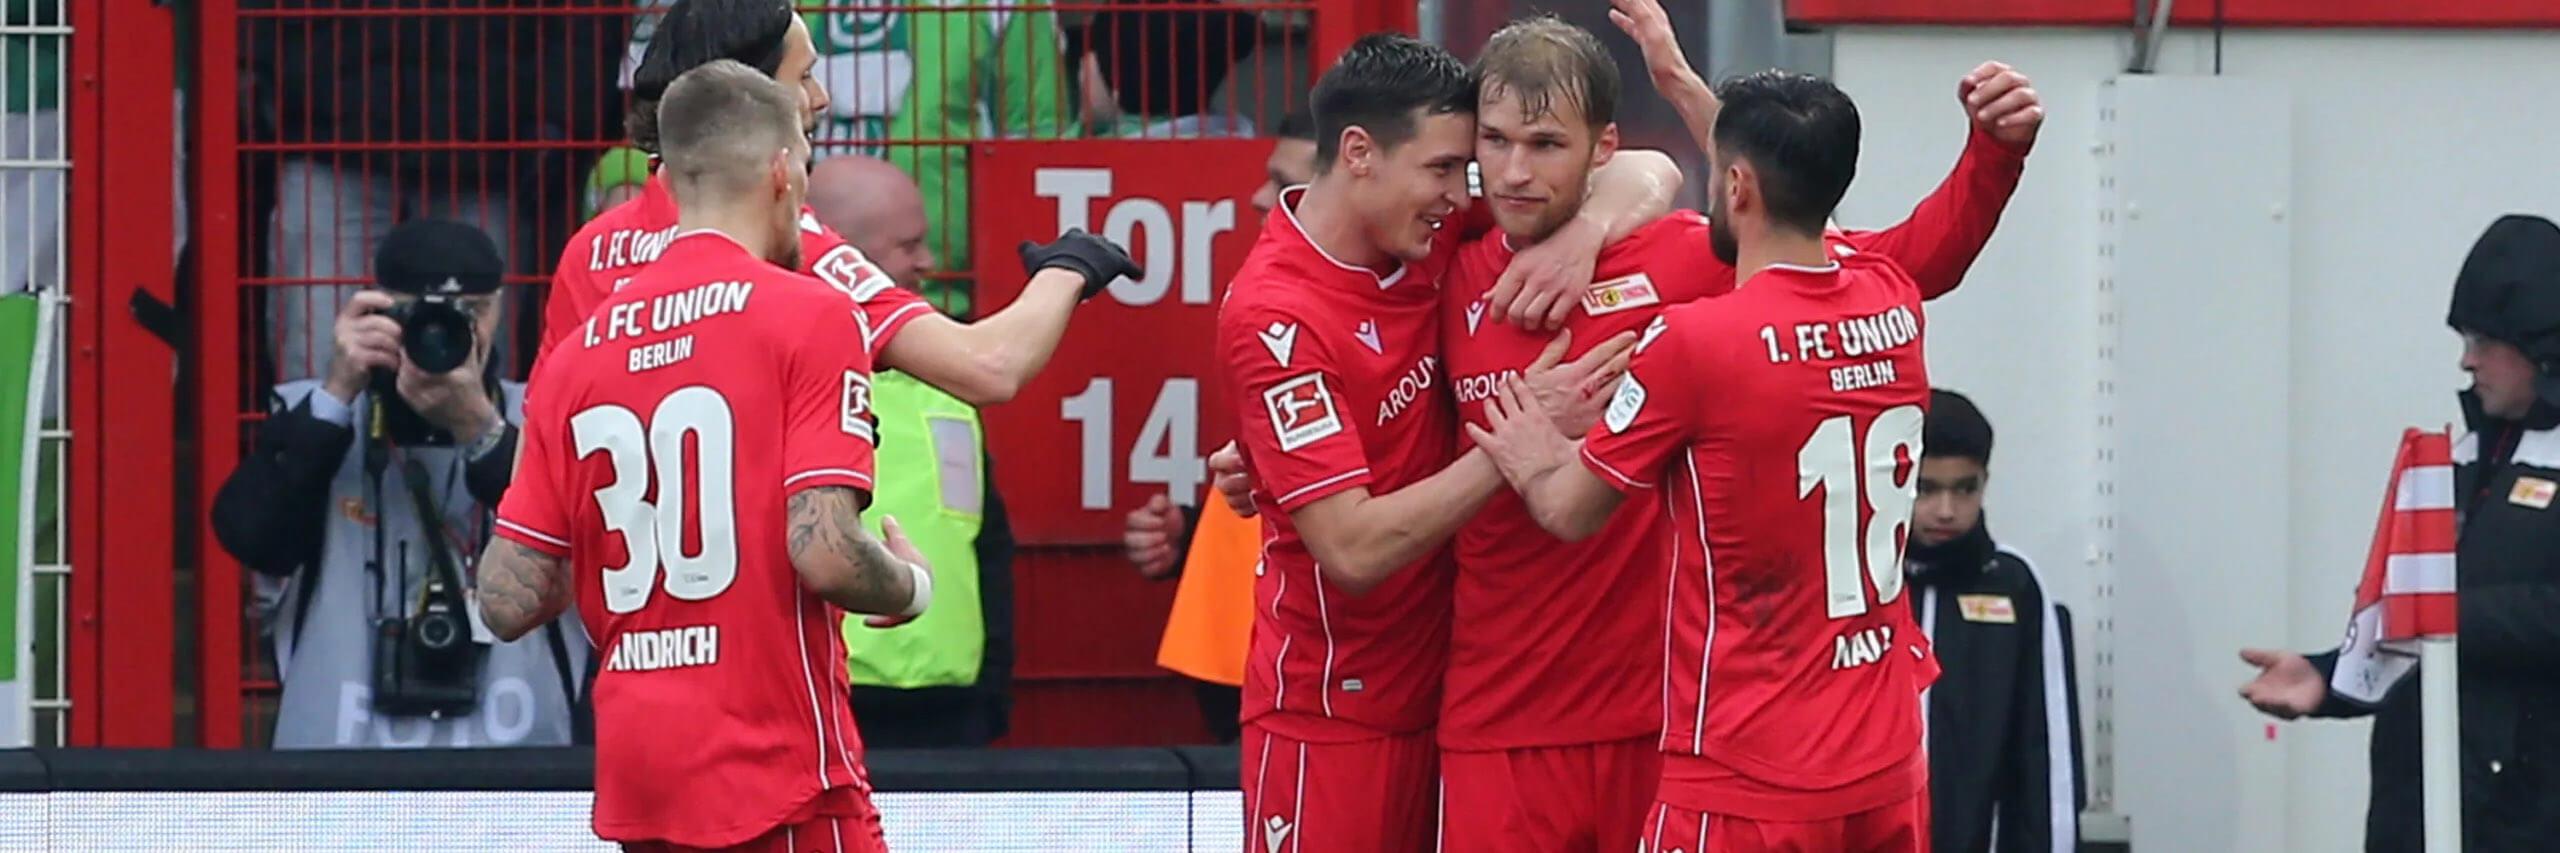 Bundesliga Schalke Vs Union Berlin Matchday 30